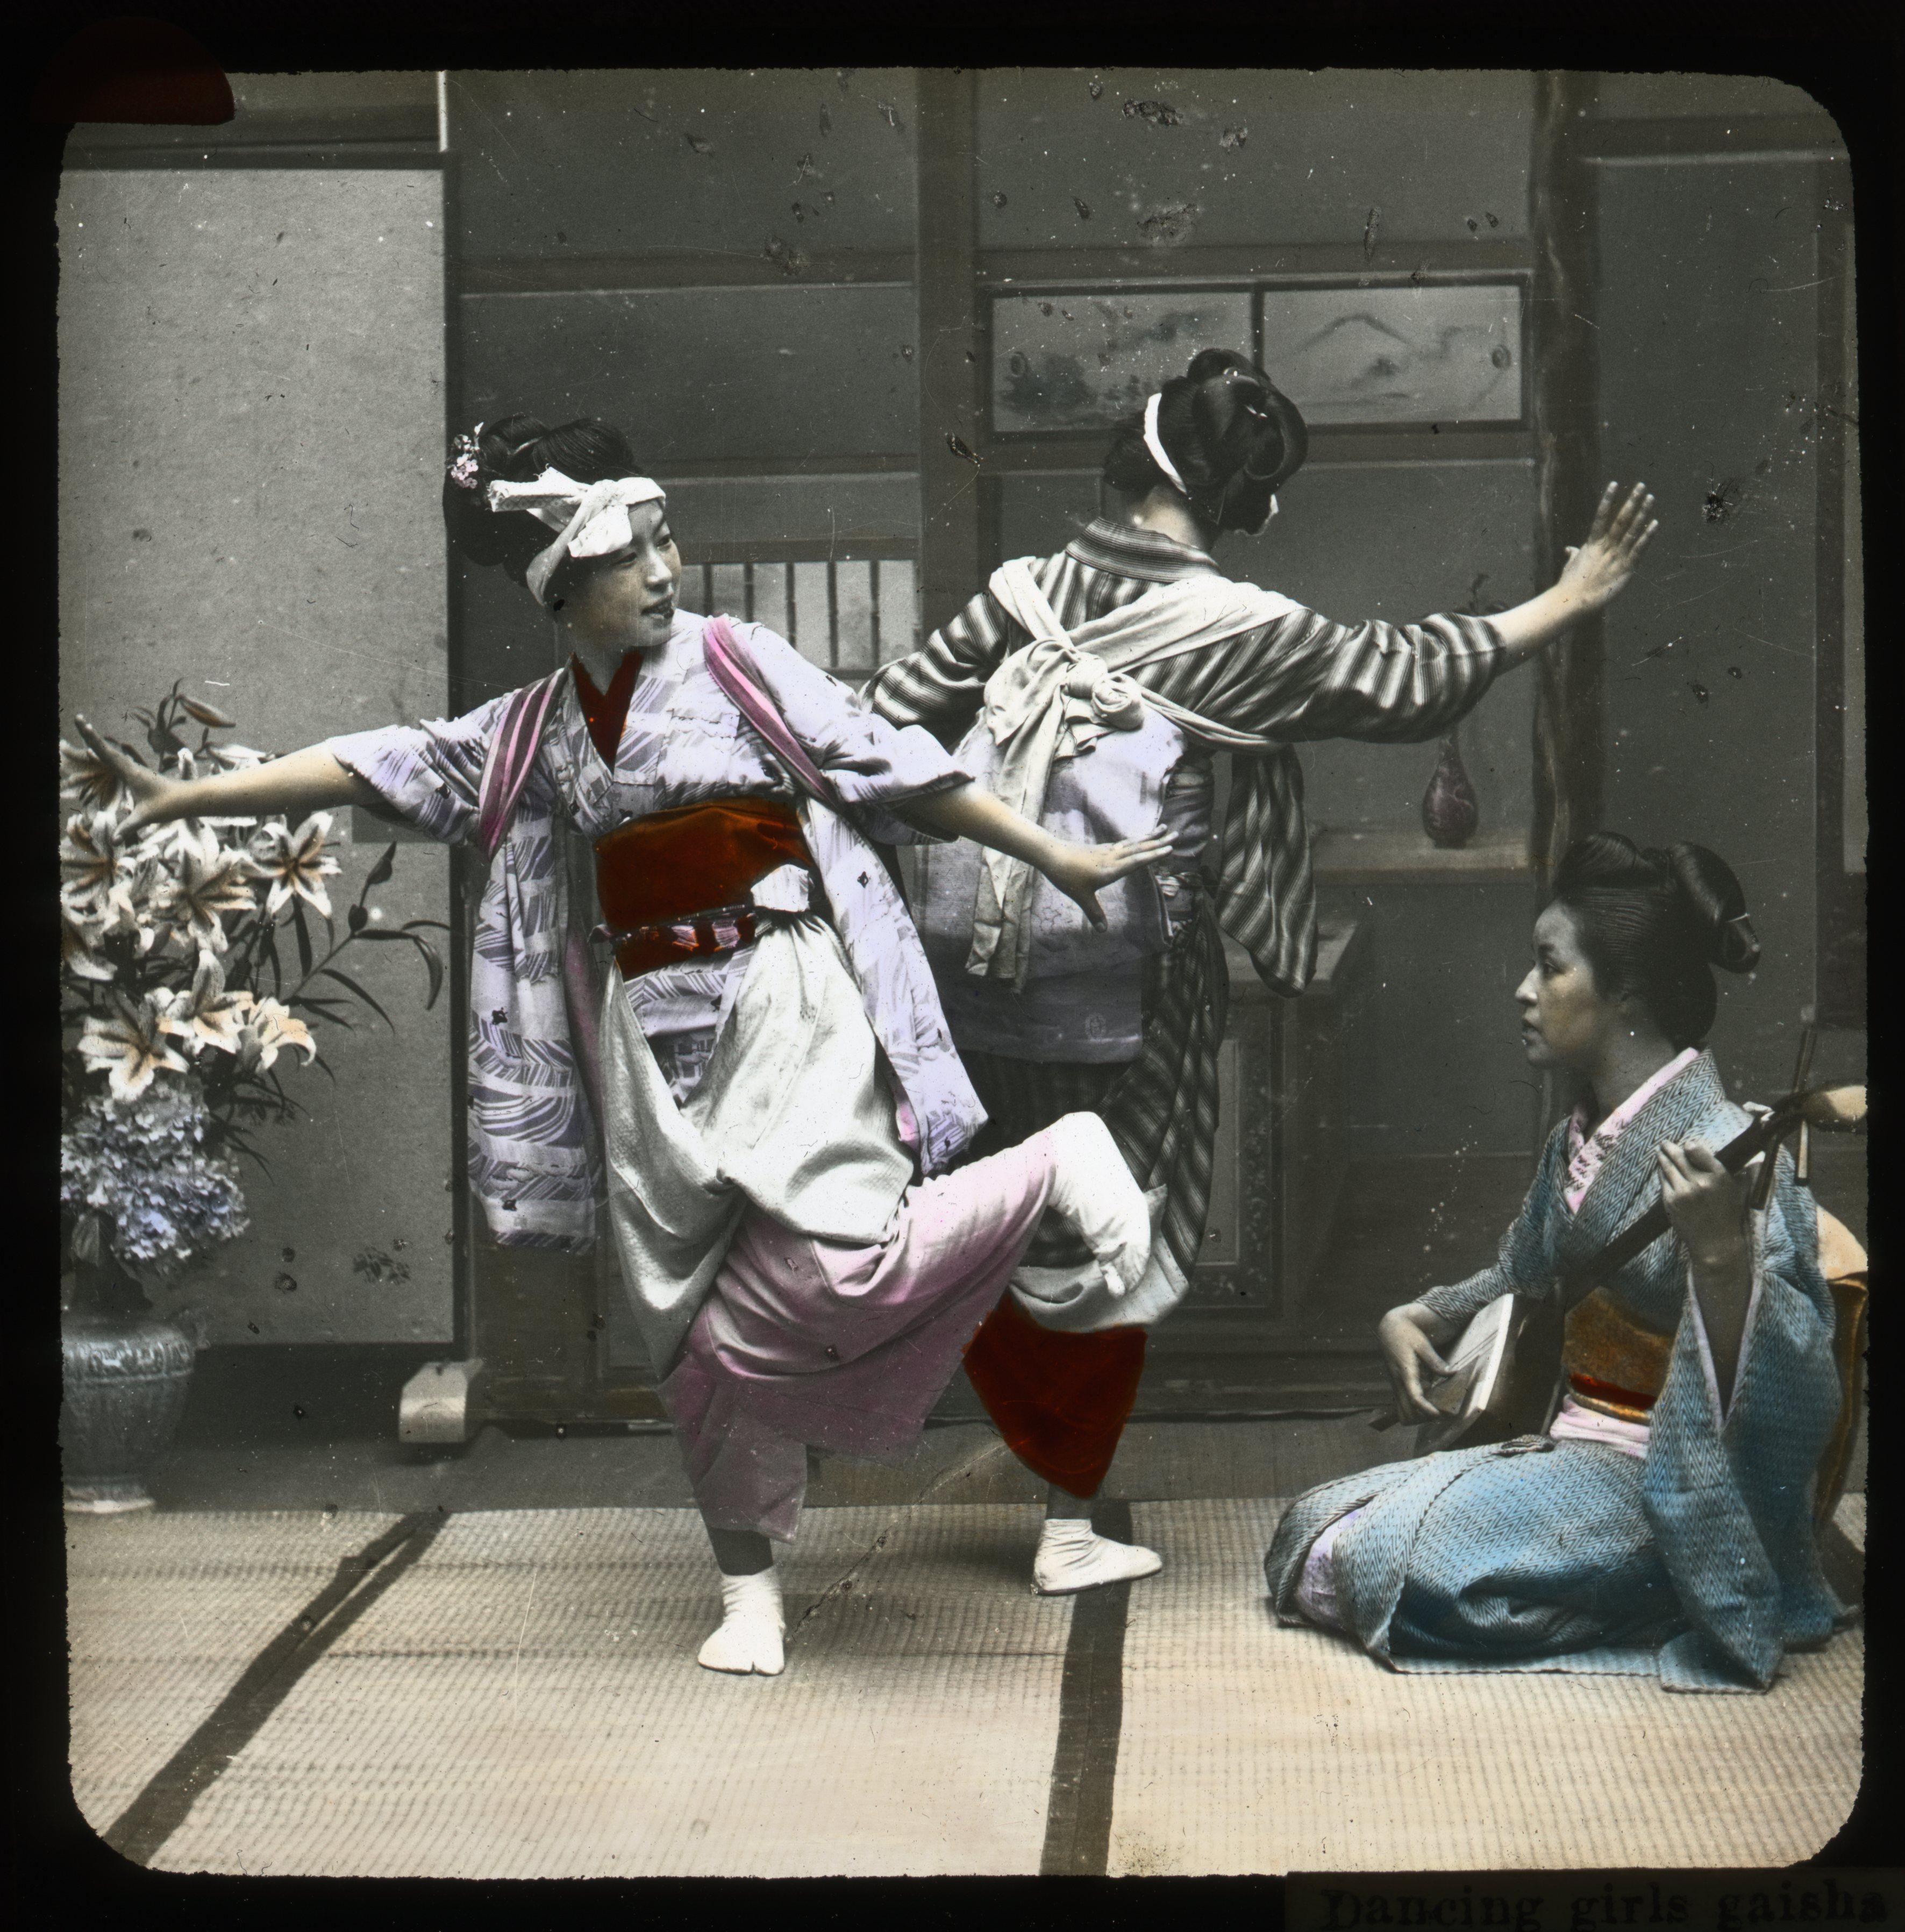 Photograph of dancing Geisha girls